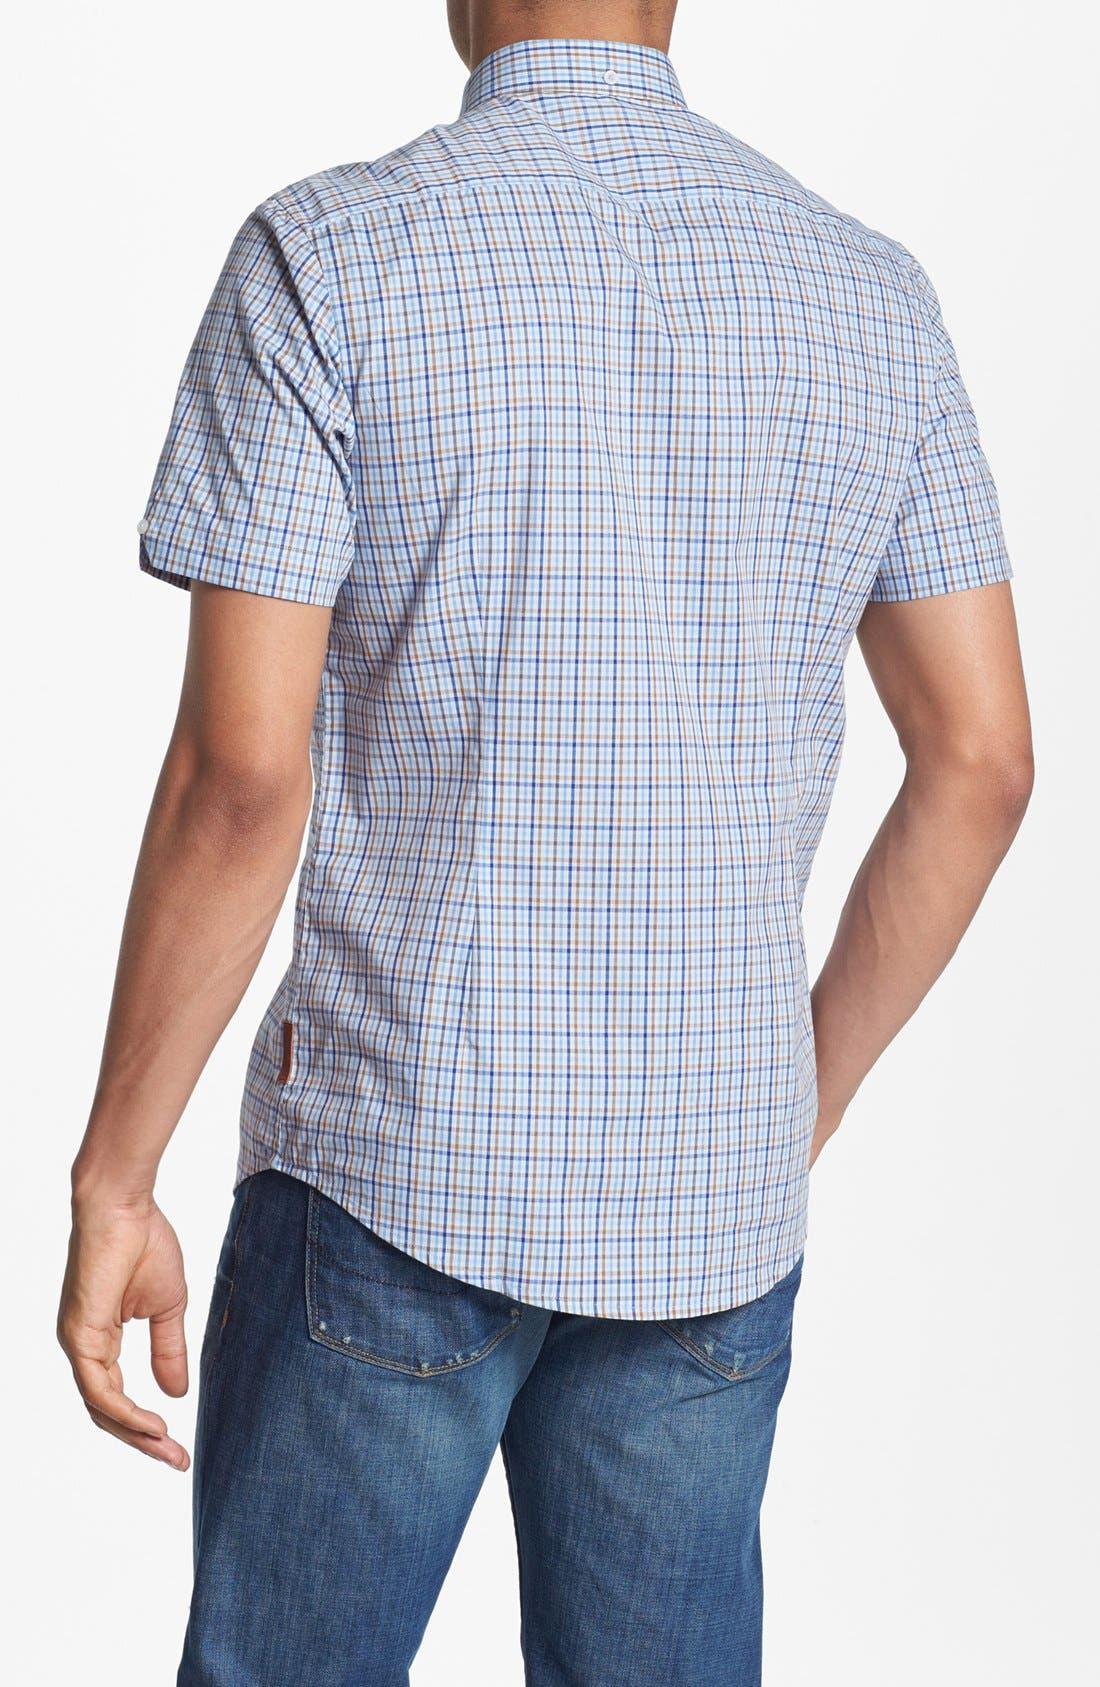 Alternate Image 3  - Ben Sherman Check Short Sleeve Woven Shirt